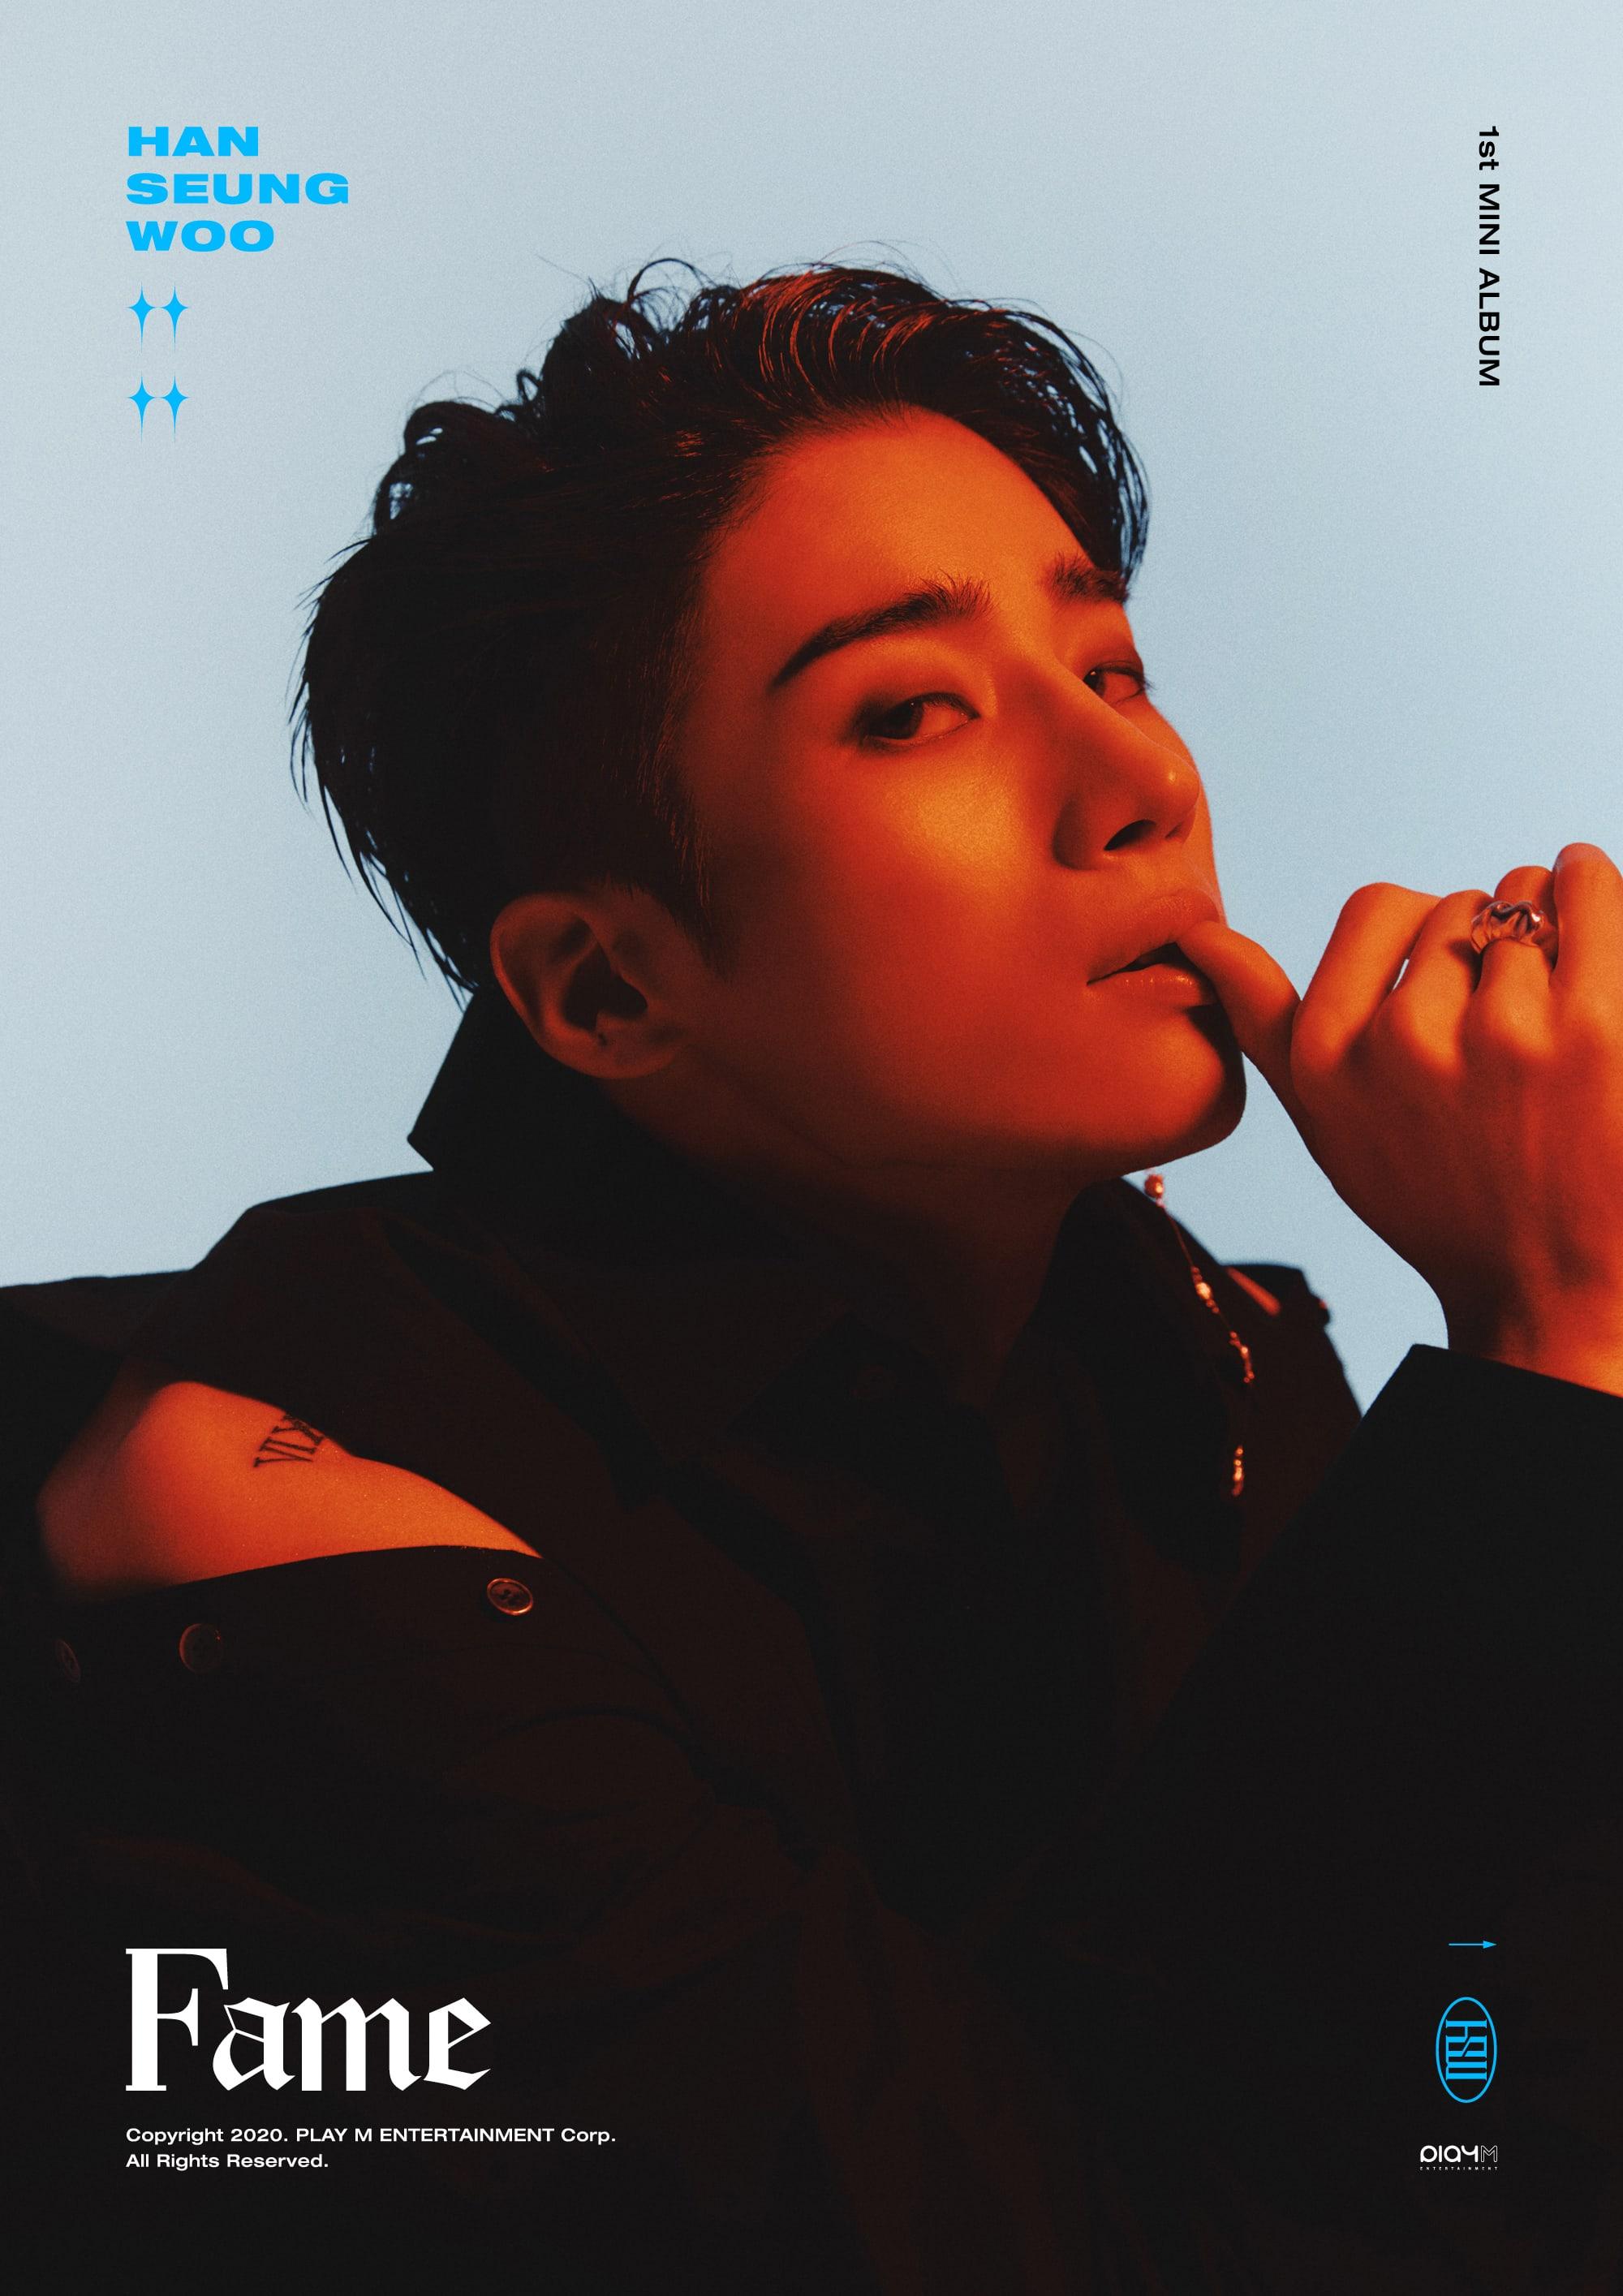 han seung woo 32